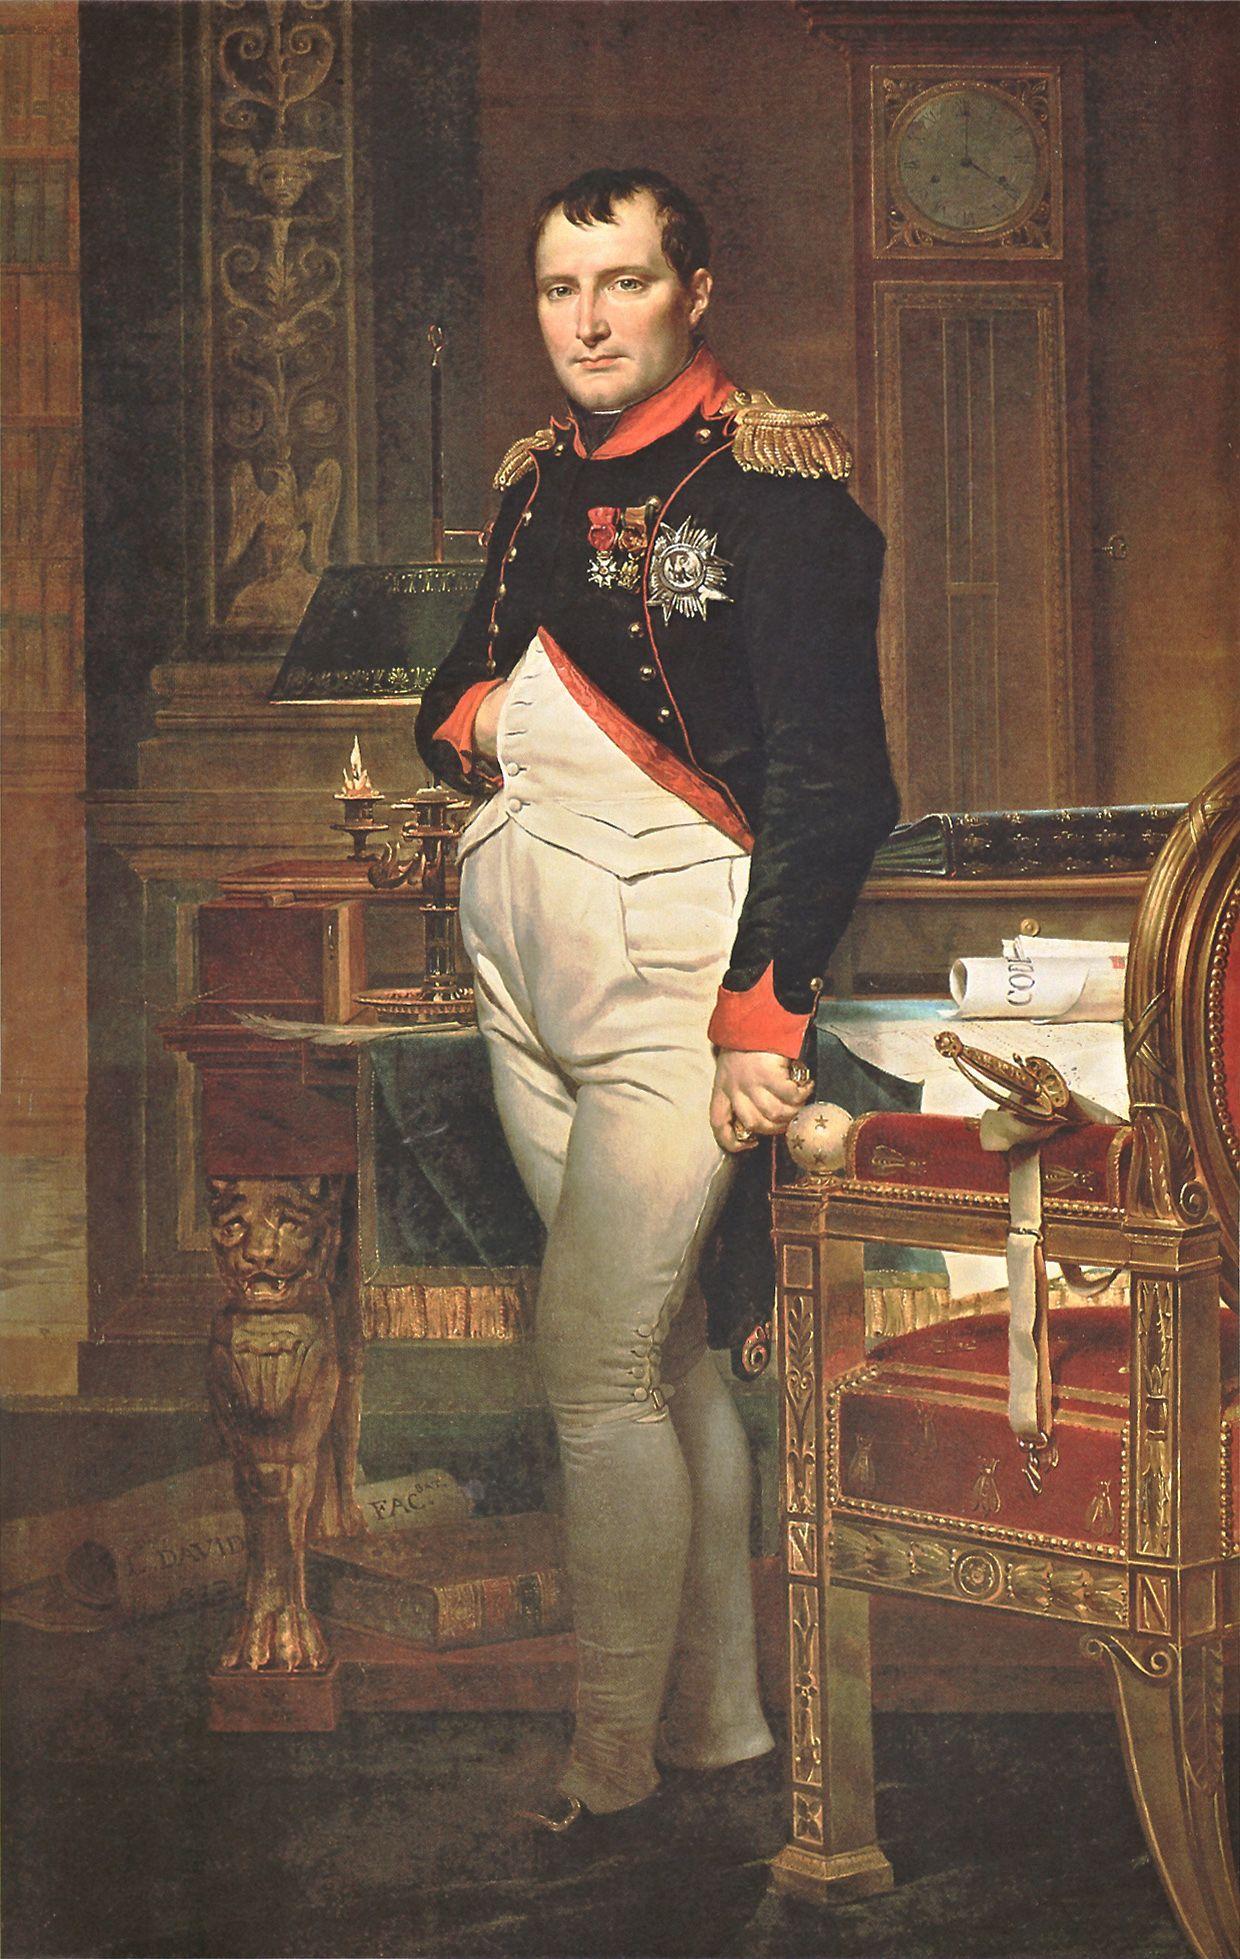 Biography of Jacques Louis David